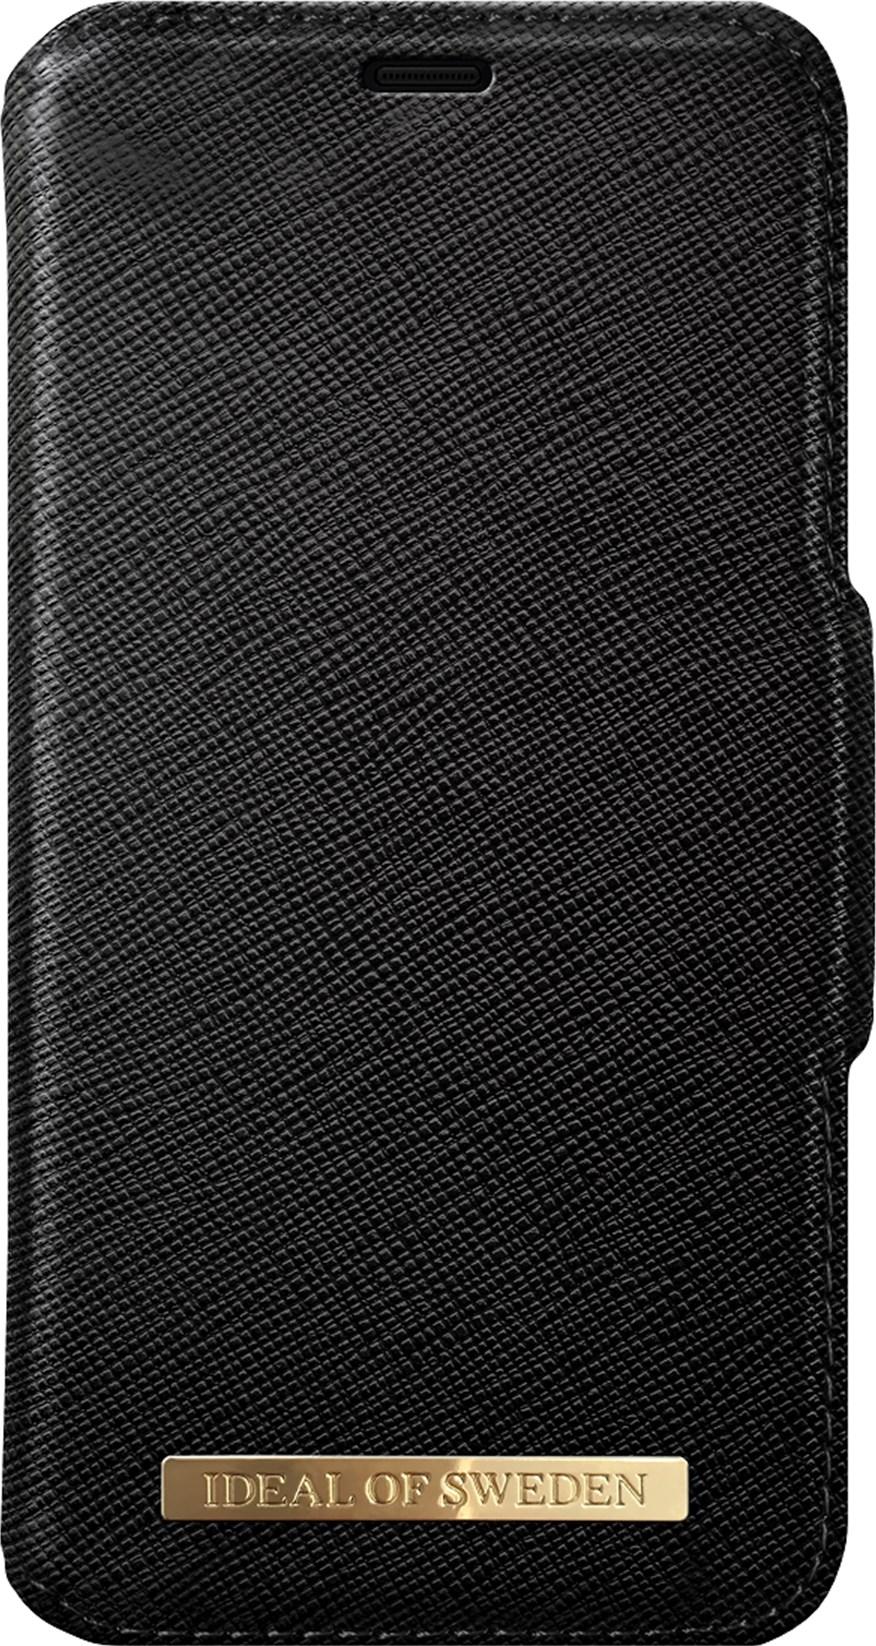 iDeal of Sweden Ideal Fashion Wallet Samsung Galaxy S10 Plus Black